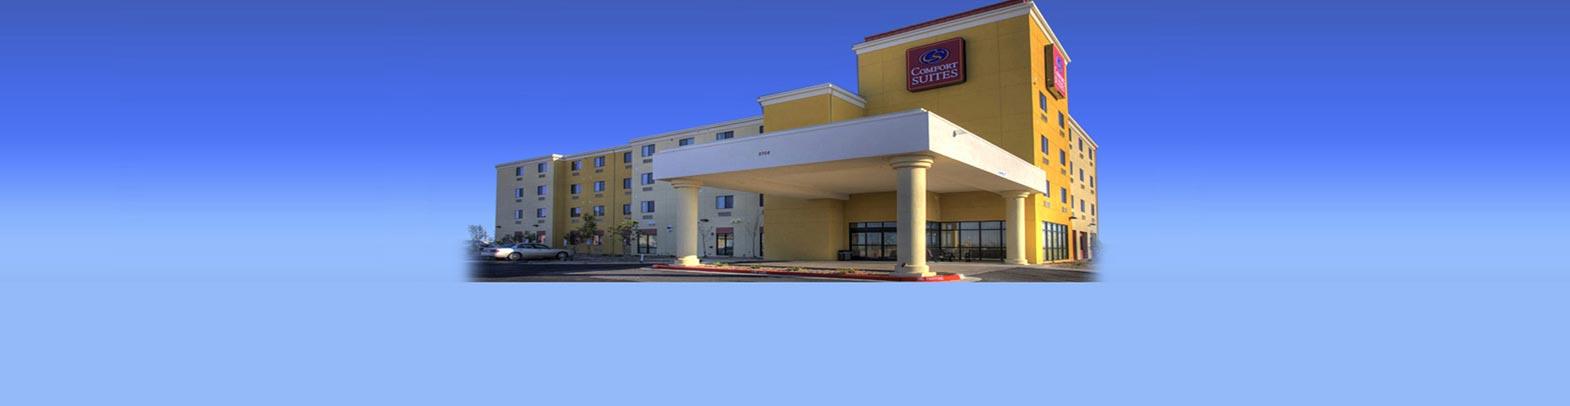 Hobbs casino in new mexico